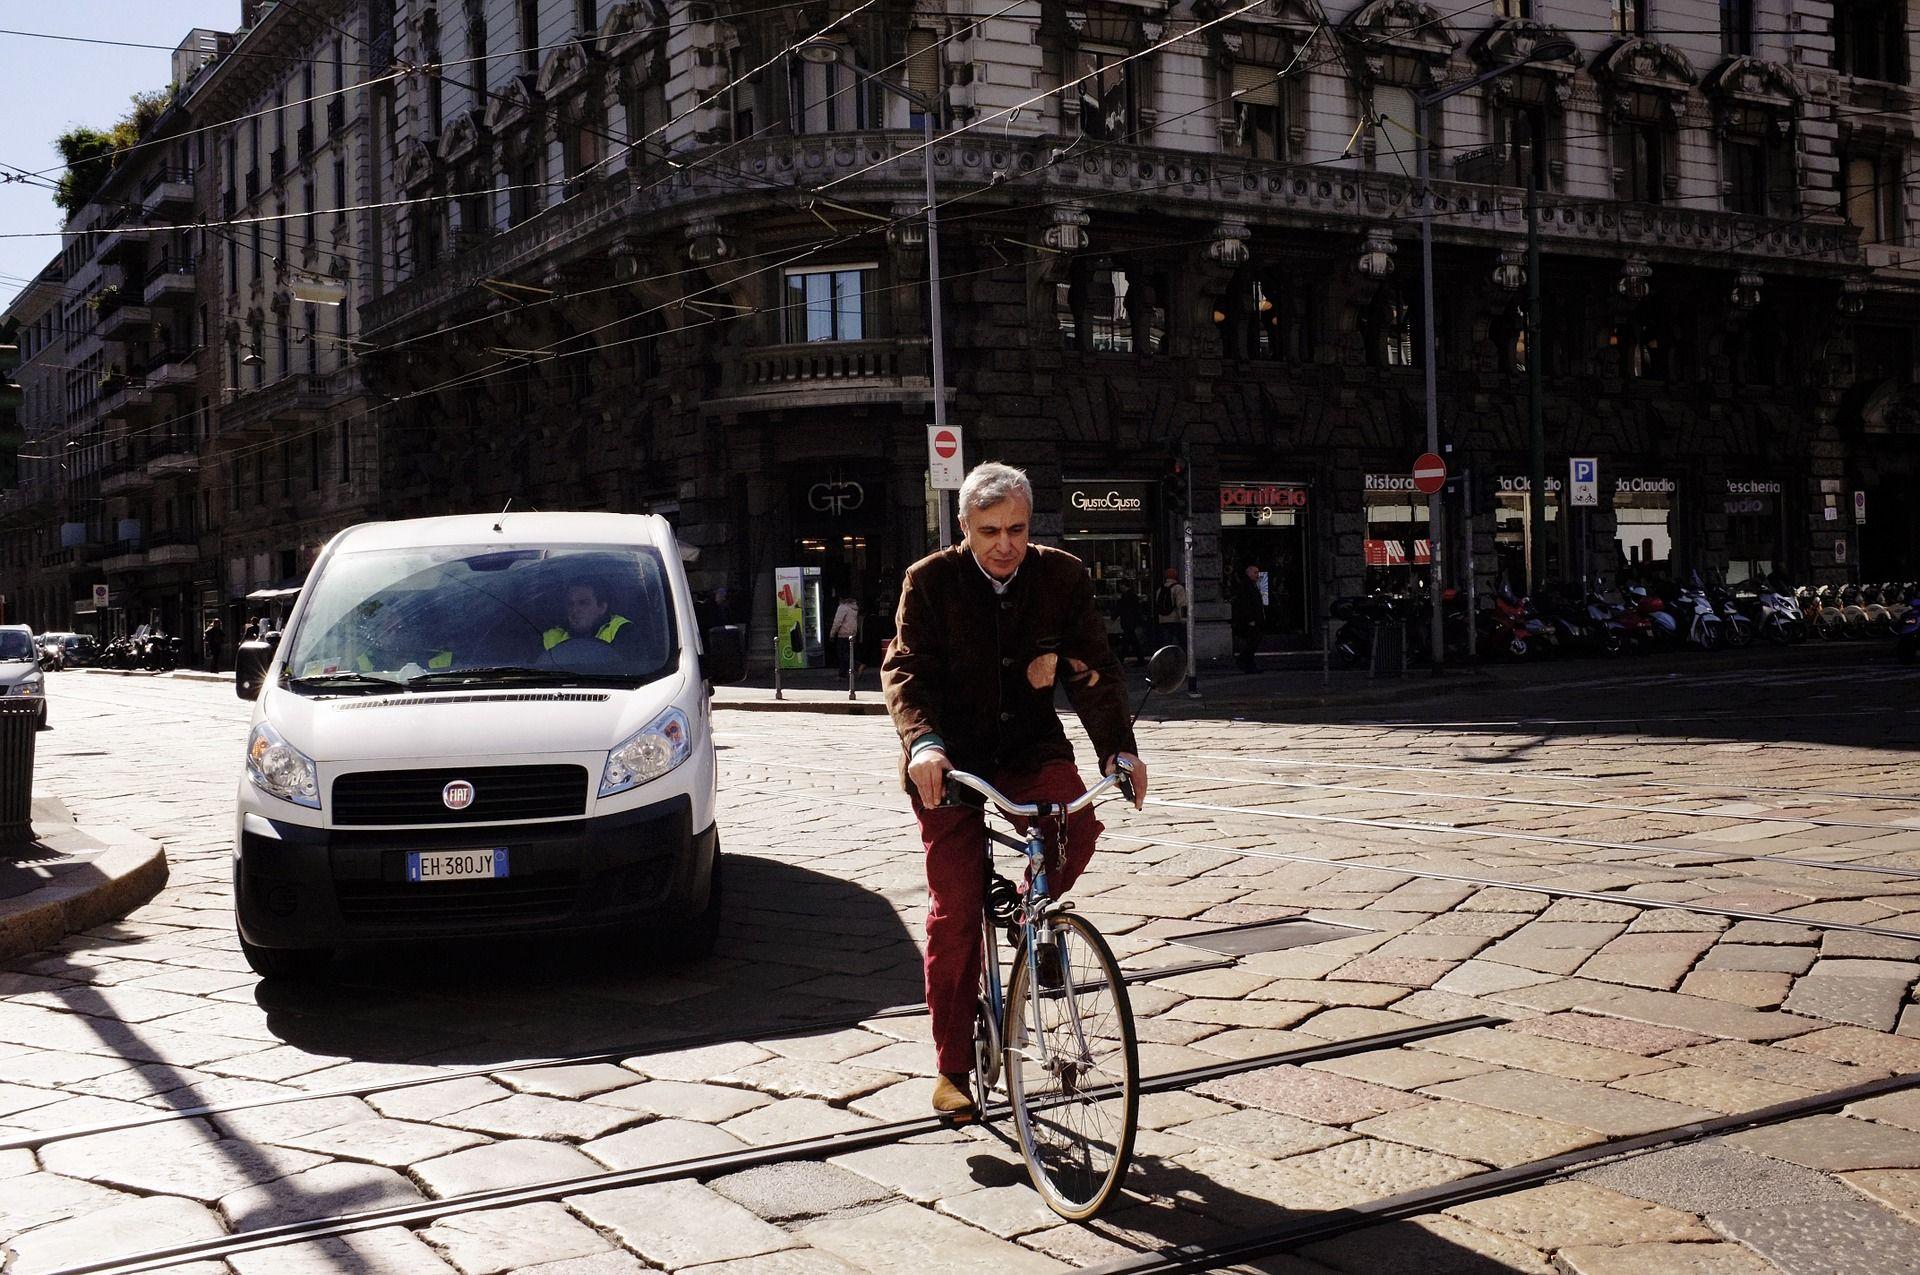 Cyklista v ulicích Milána. Foto: Igor Saleviev / Pixabay.com